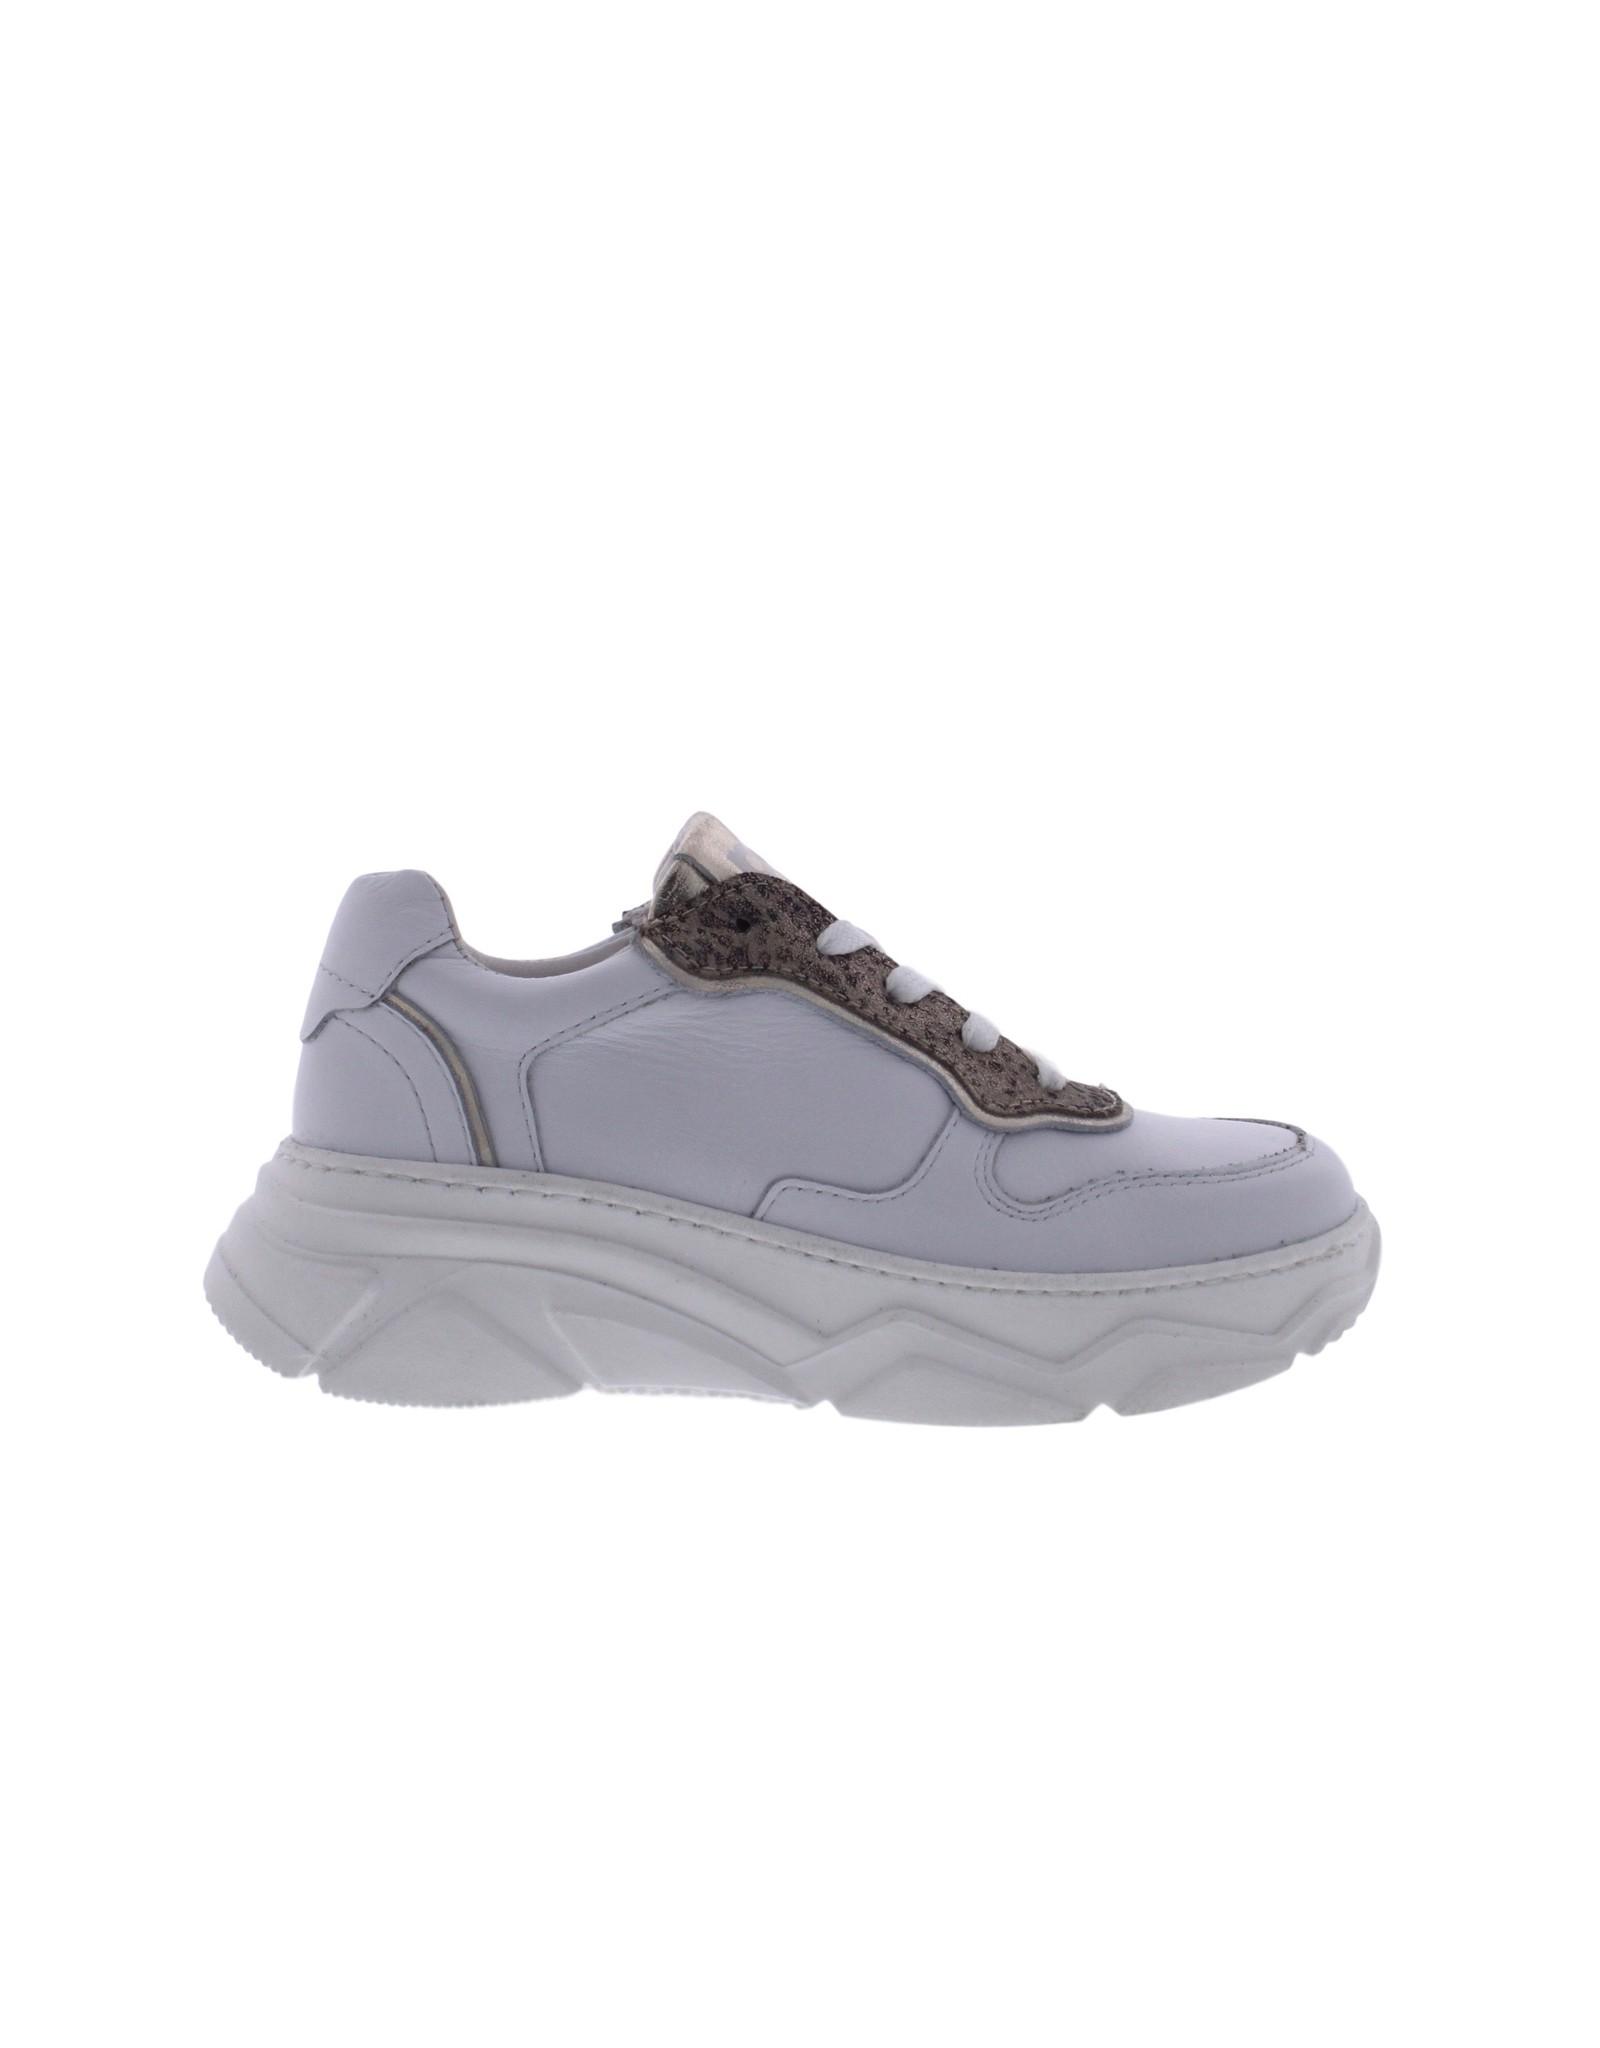 Piedro Piedro - Meisjes Sneaker Wit Print